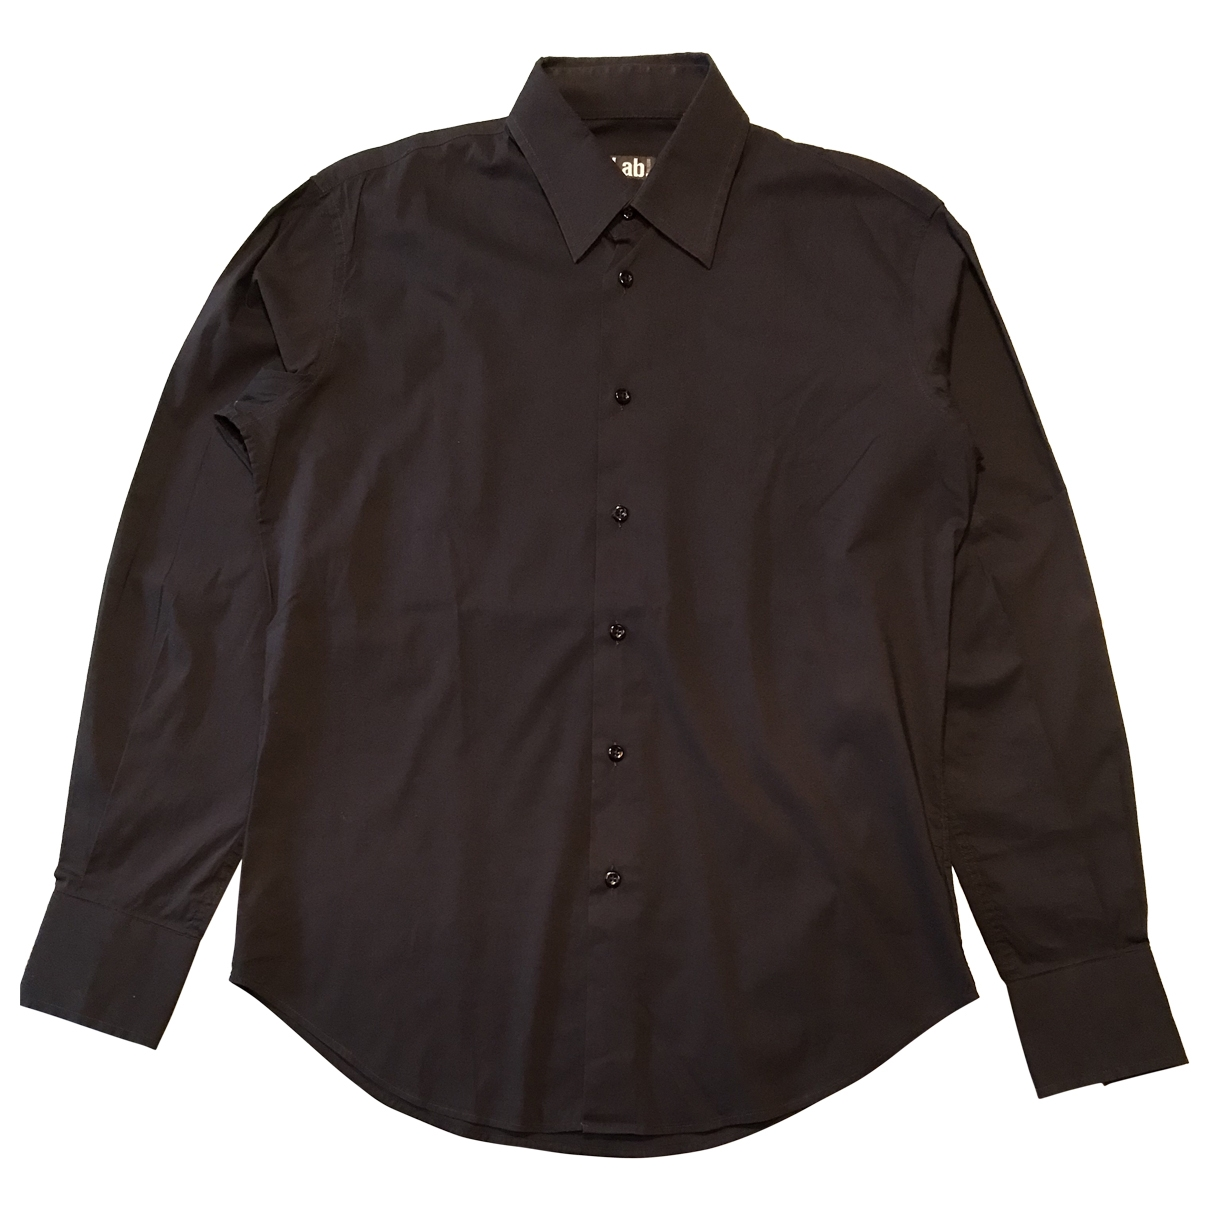 Pal Zileri \N Blue Cotton Shirts for Men 41 EU (tour de cou / collar)